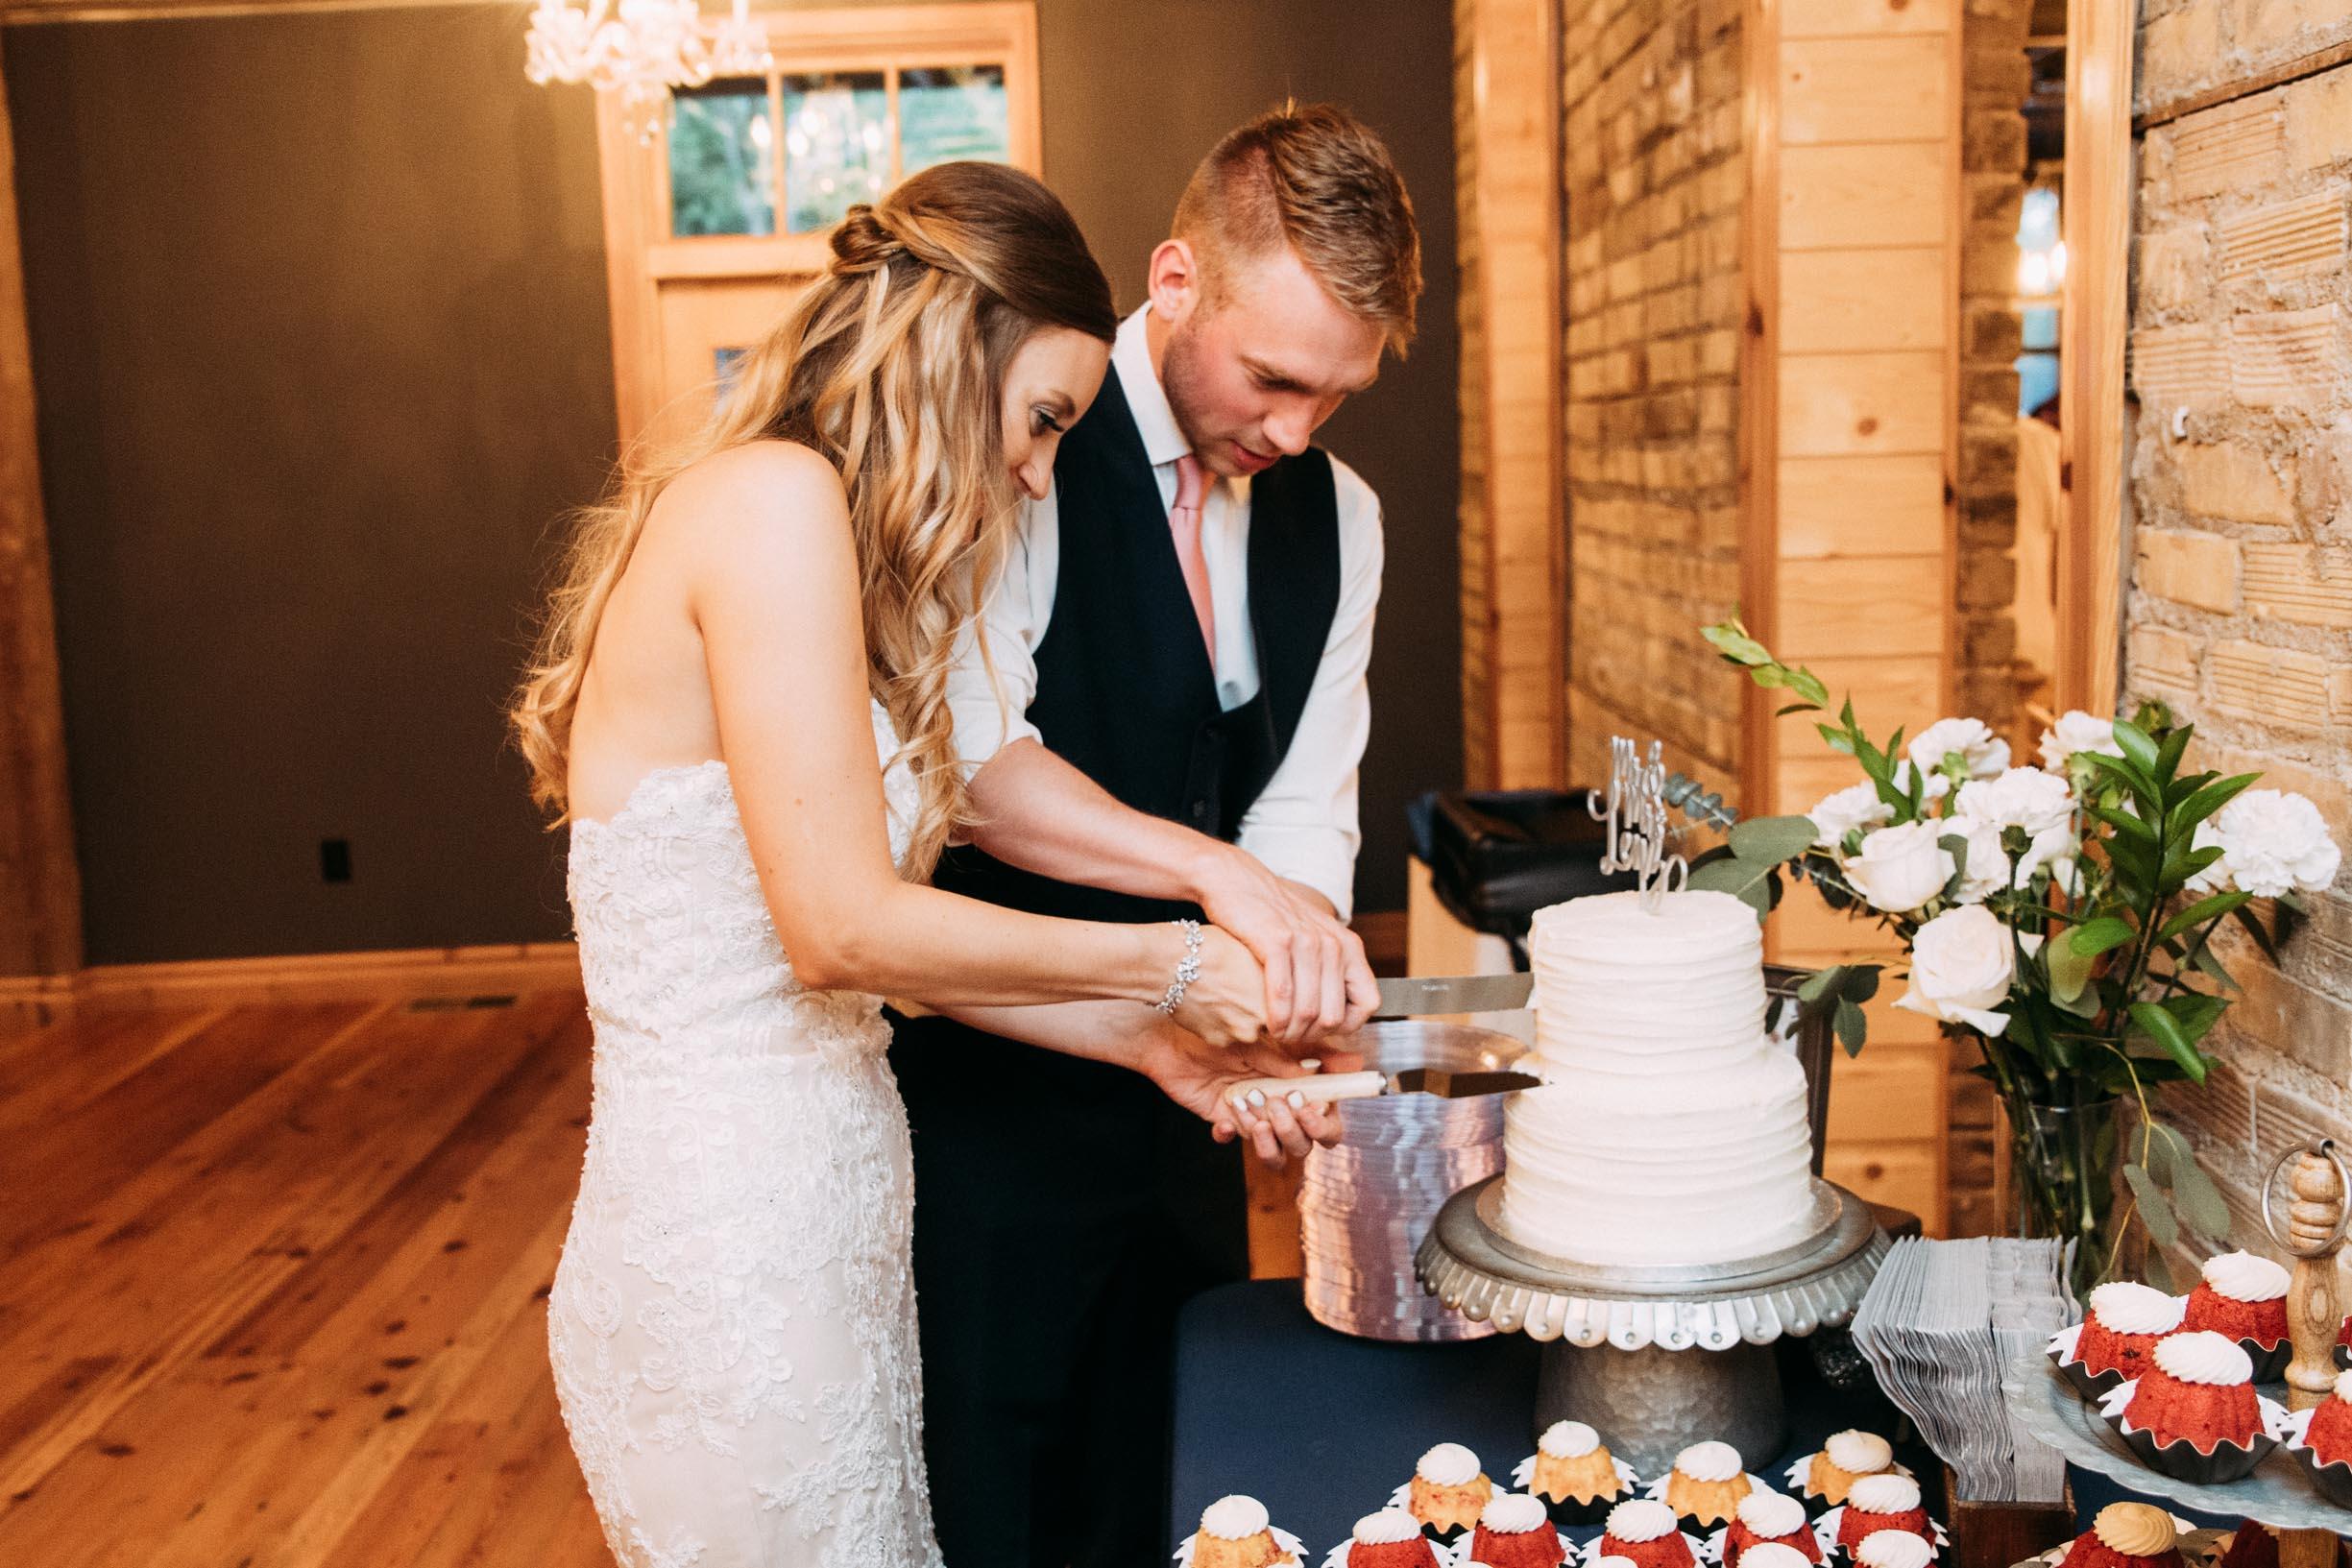 73-WeddingsattheBroz_Minnesota_WeddingBlog_Cake.jpg